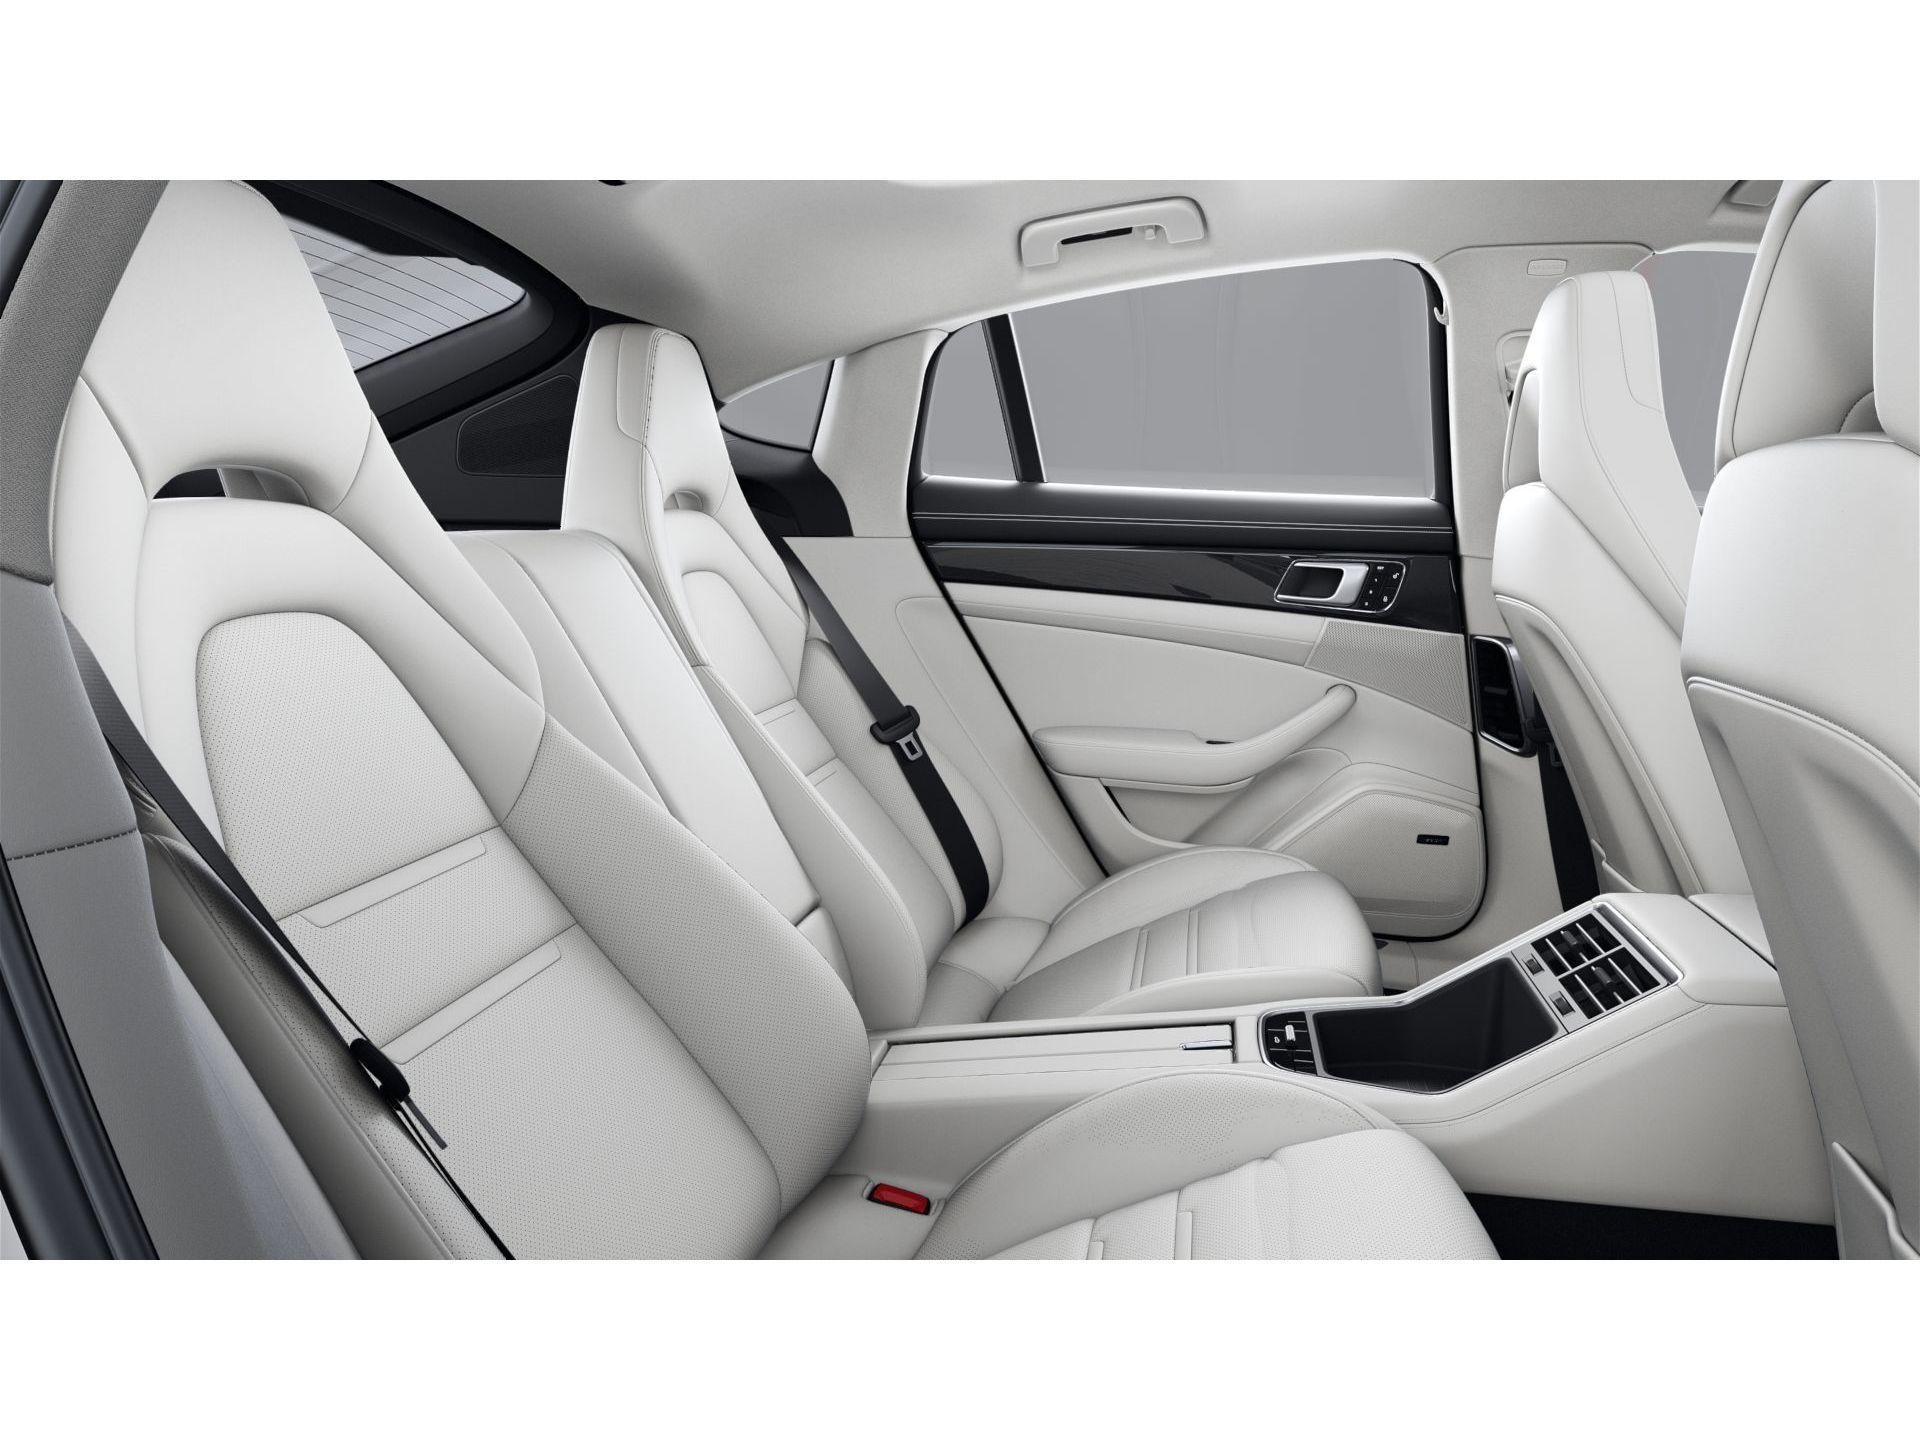 2021 Porsche Panamera 4 E-Hybrid – 4